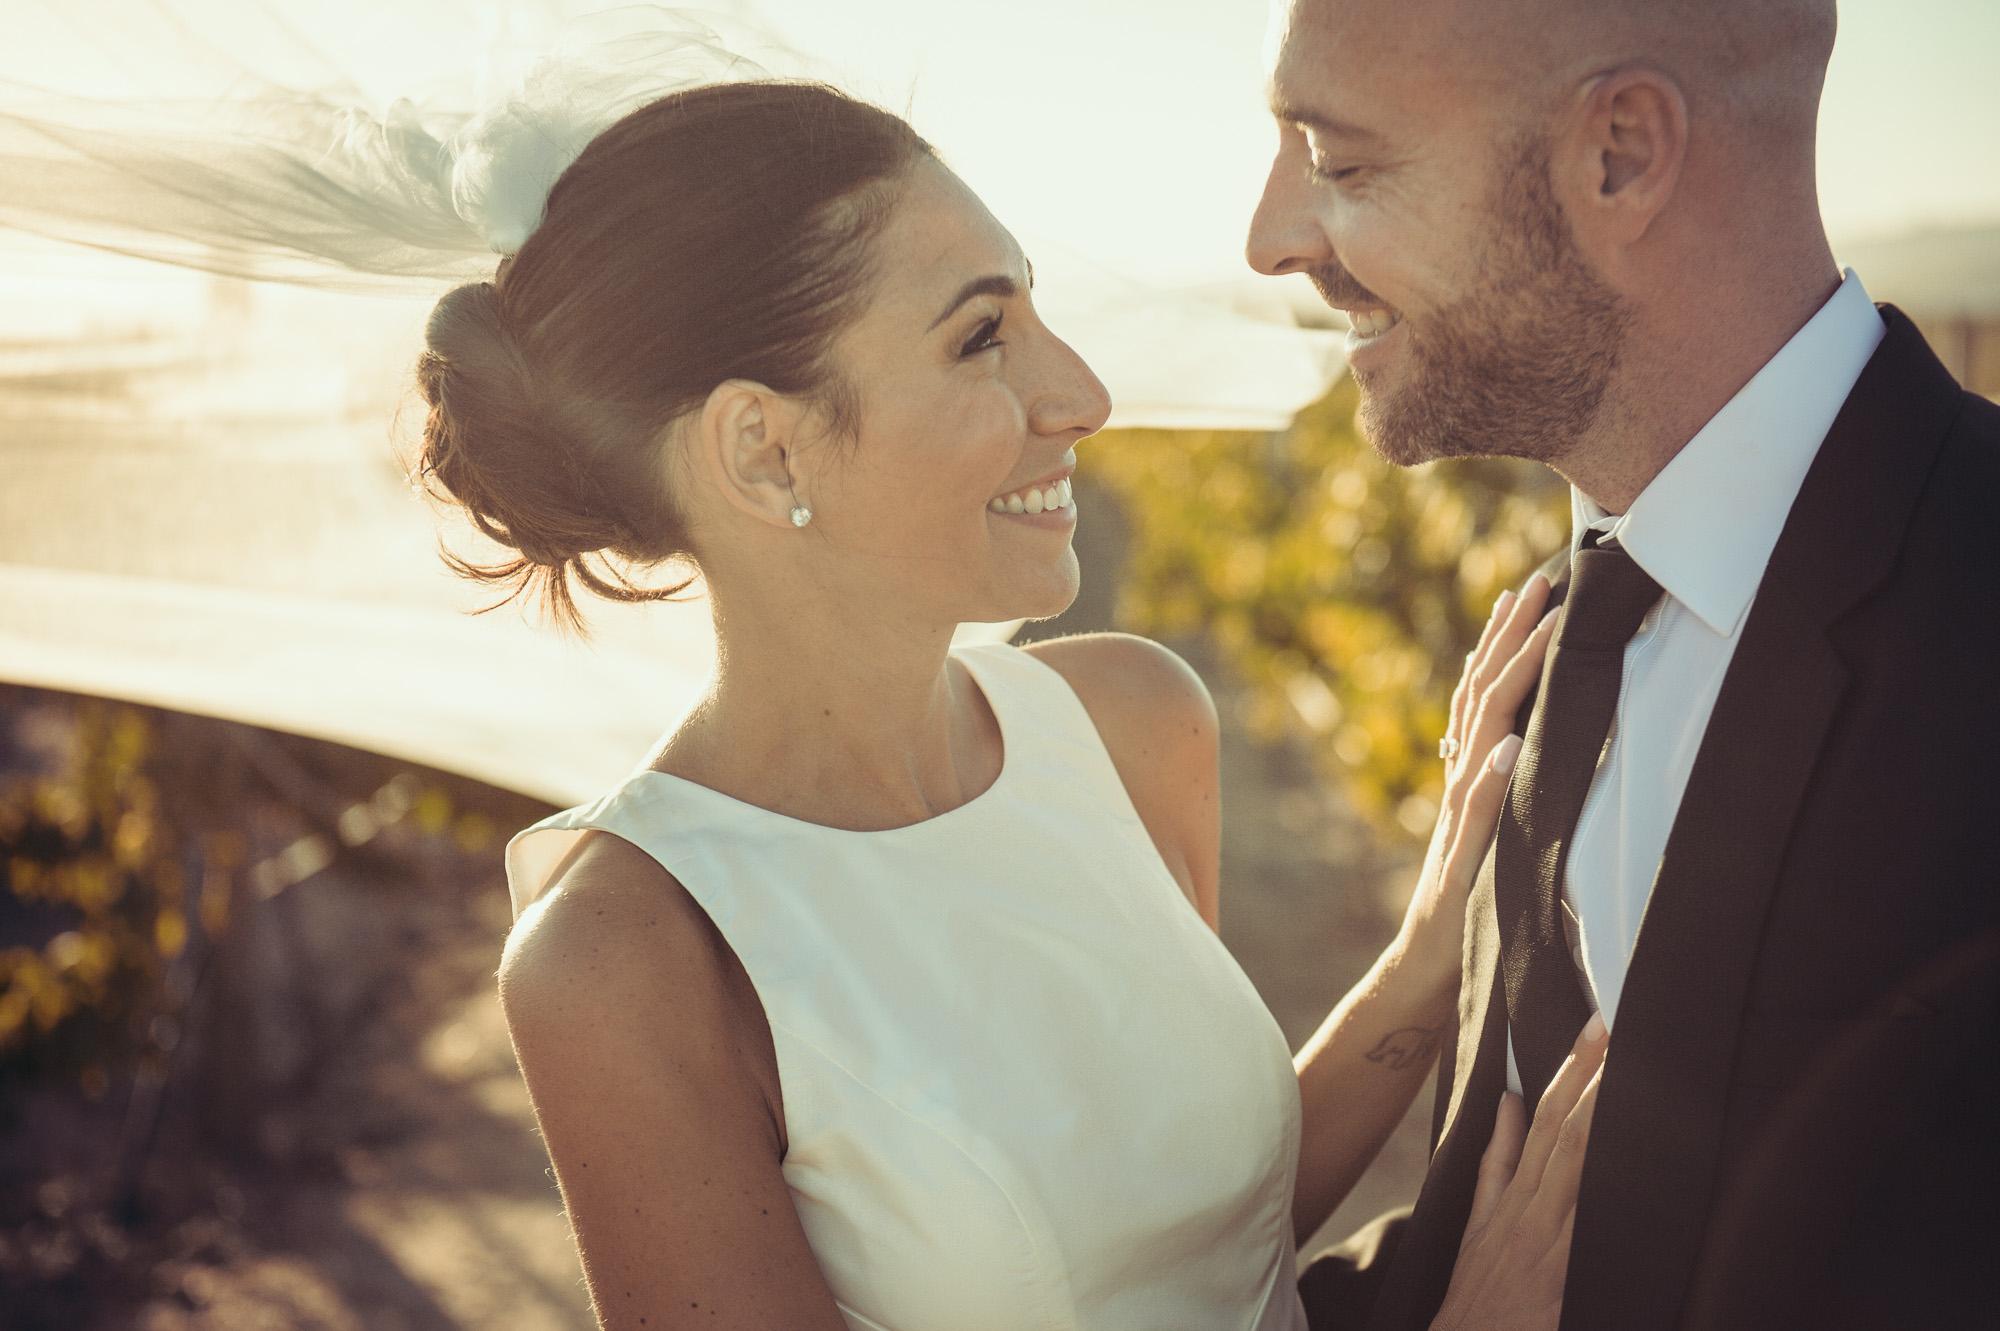 john-henry-wedding-photographer-kiara-ashley-001-22.jpg